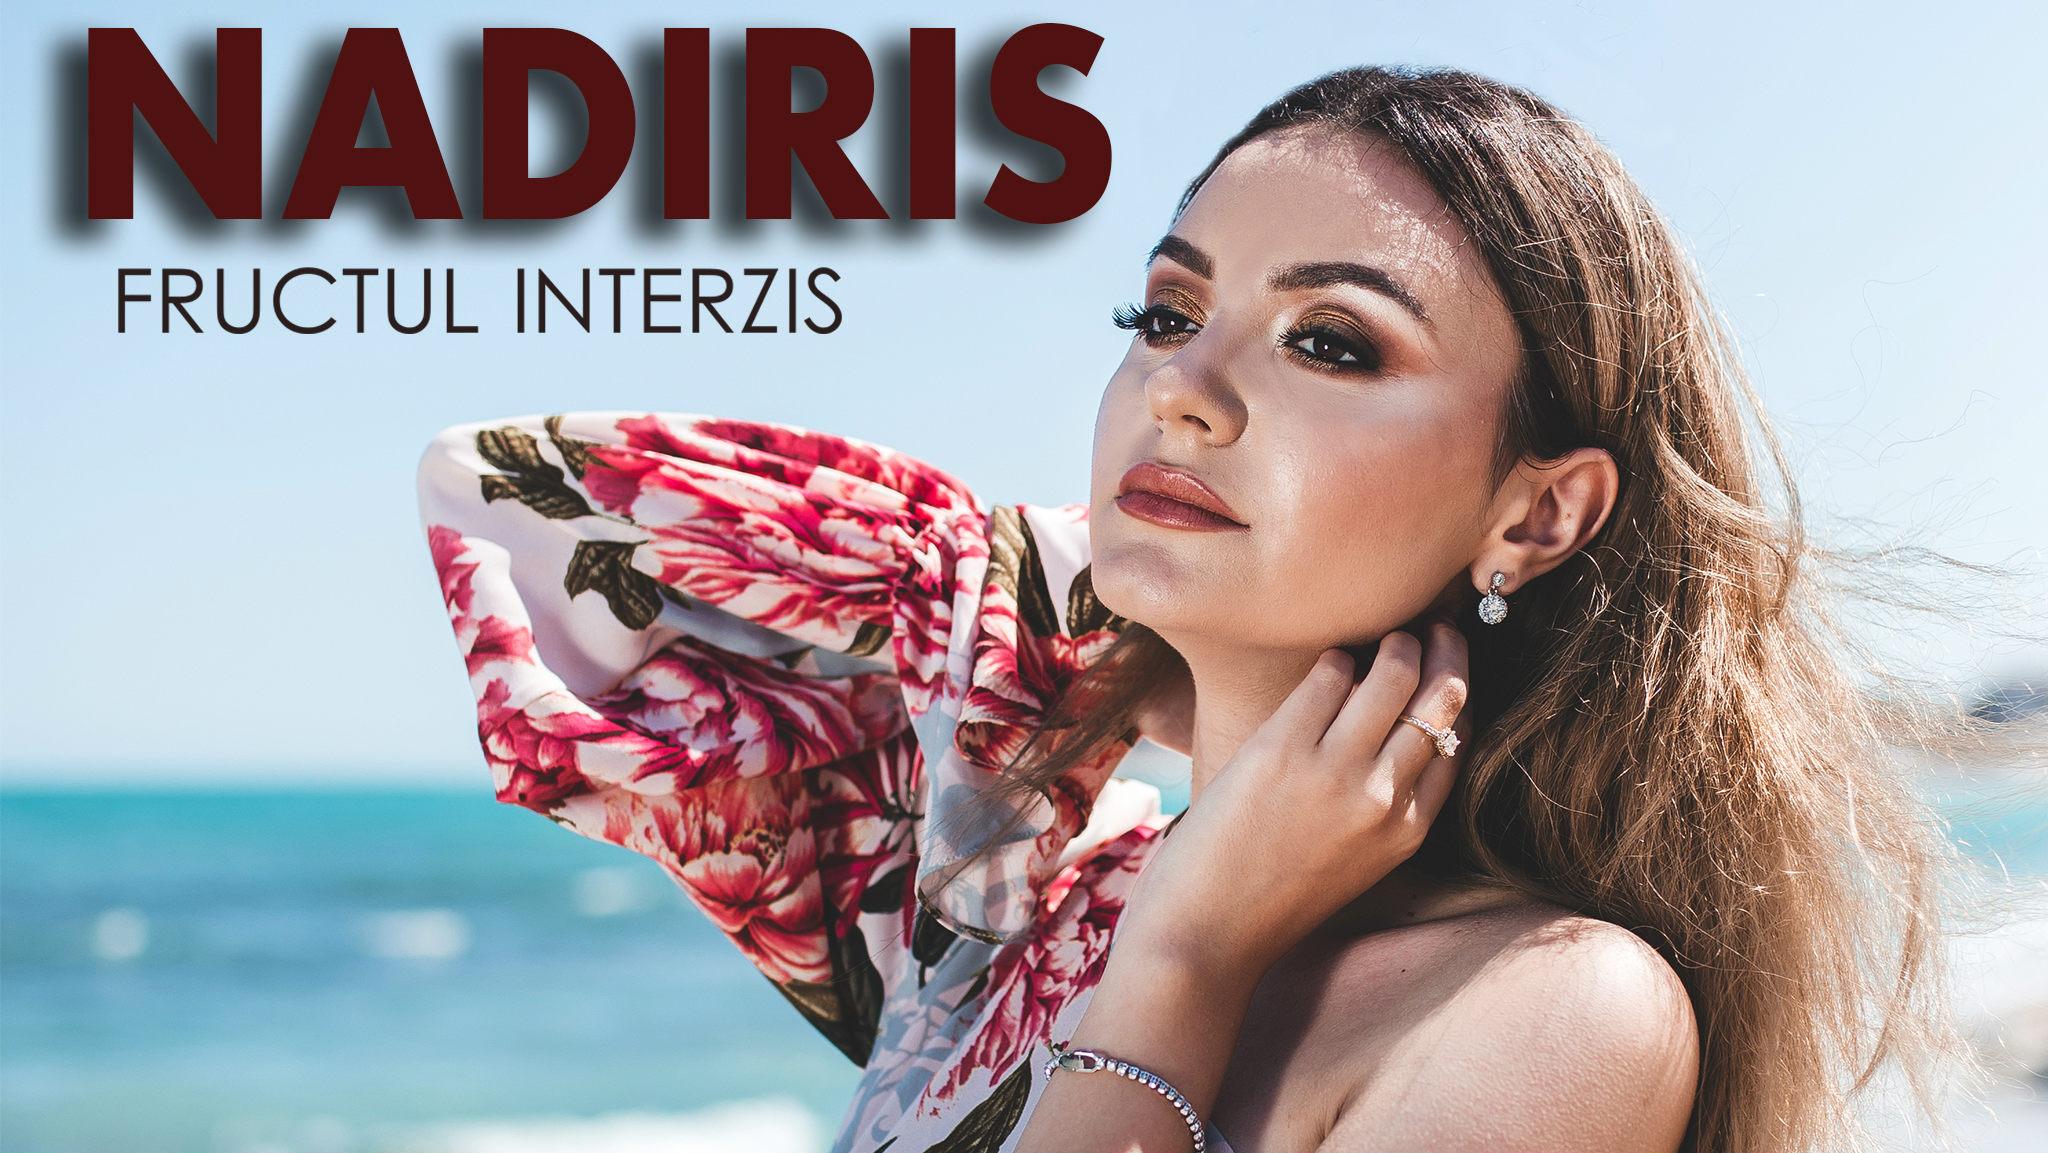 Nadiris - Fructul interzis - Știri